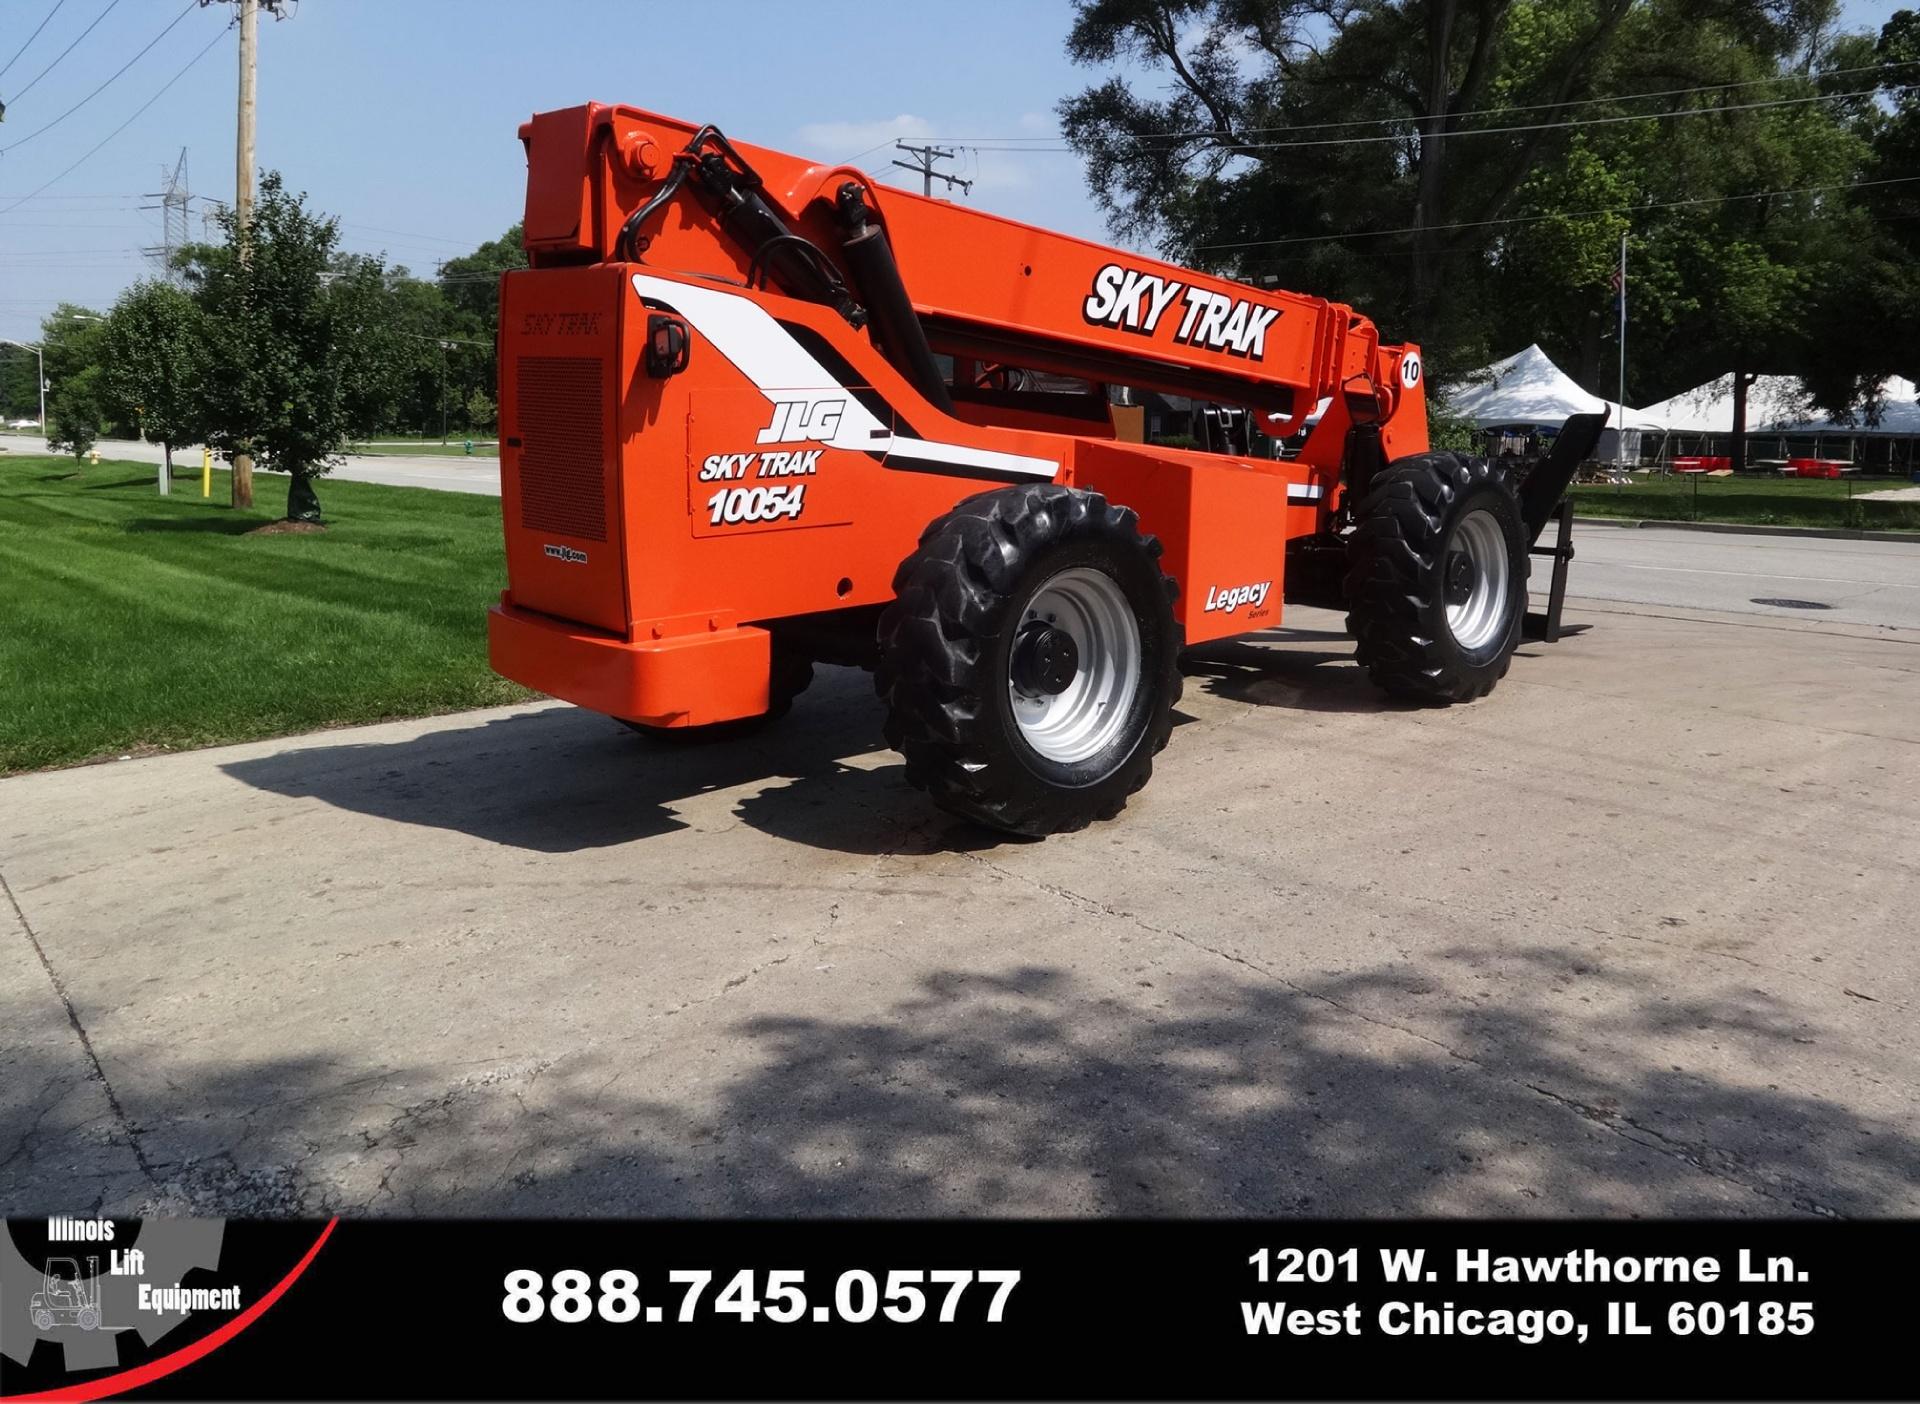 Used 2002 SKYTRAK 10054  | West Chicago, IL